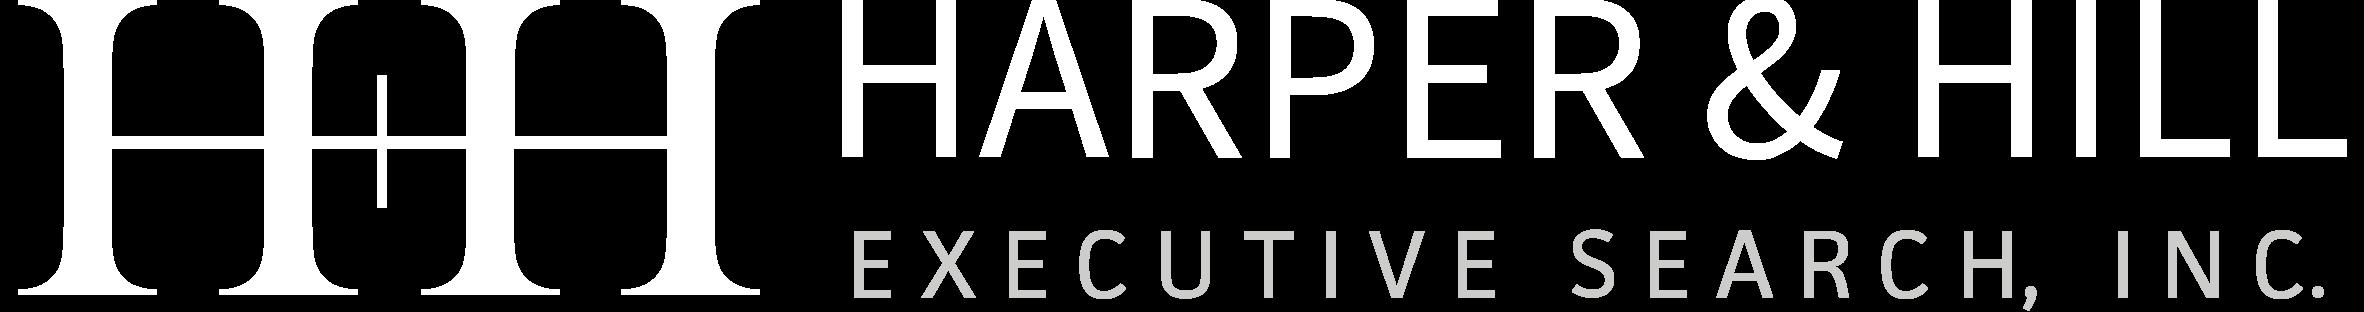 Harper and Hill Executive Search, Inc.